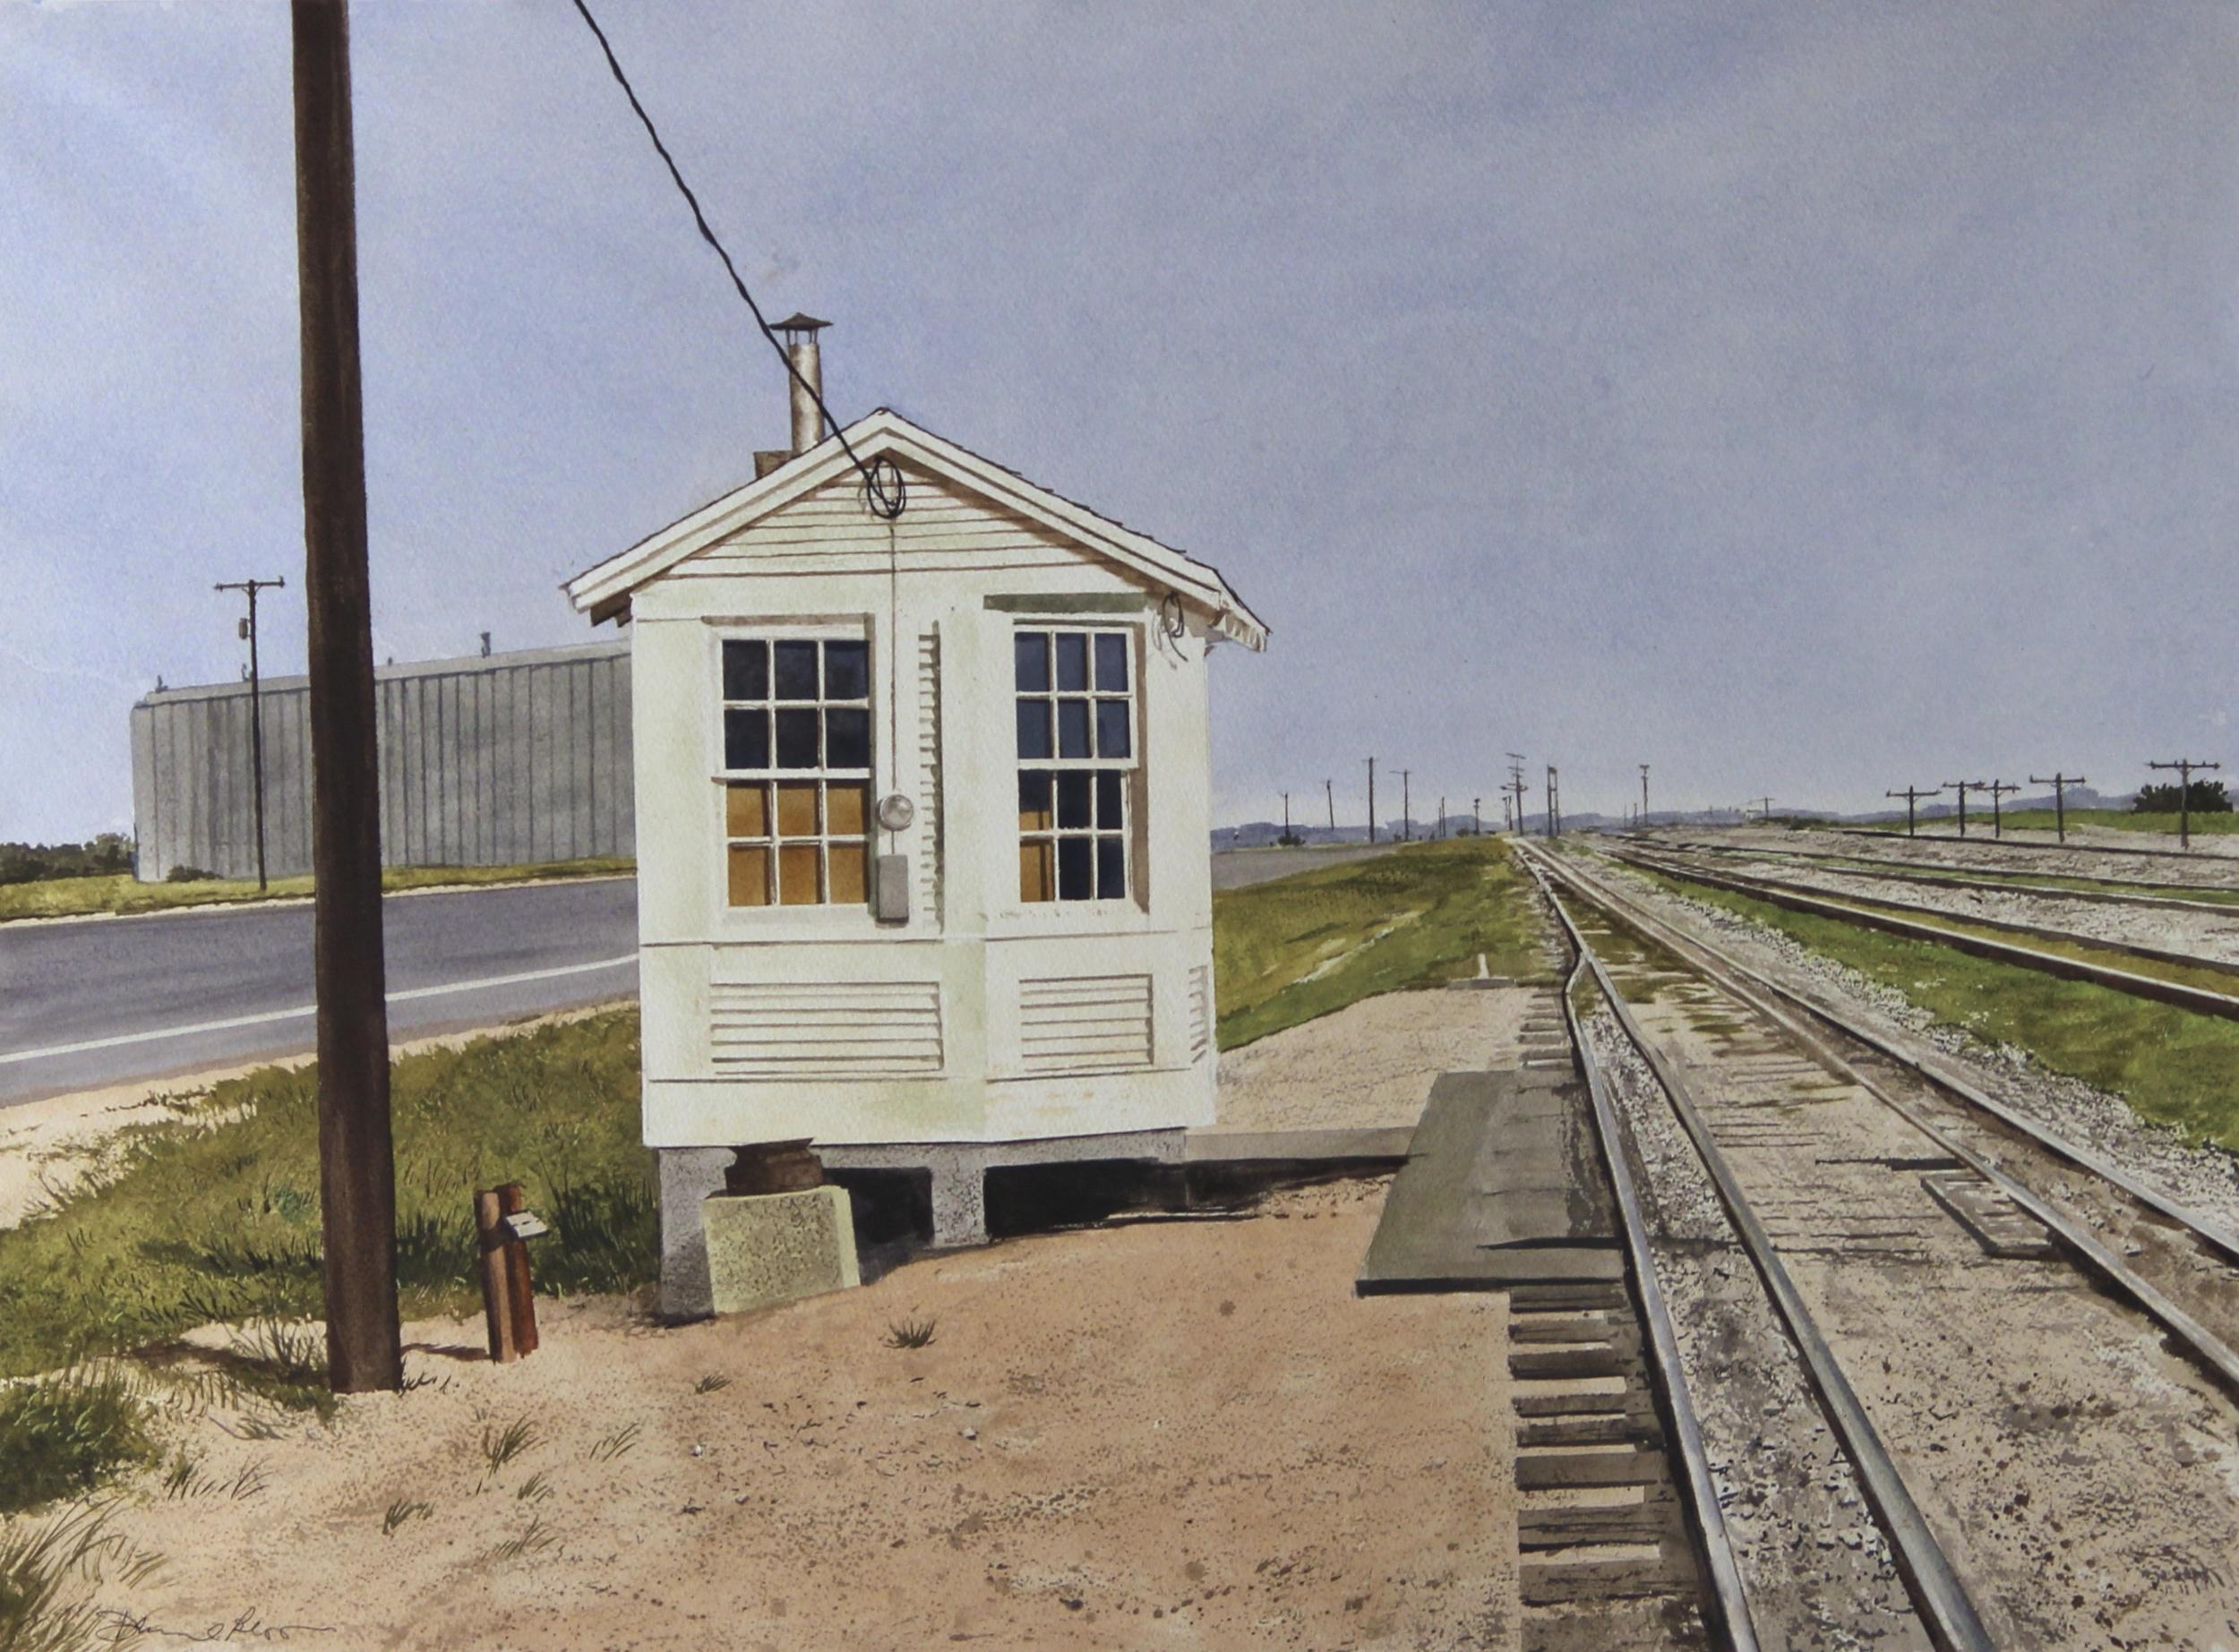 "Daniel Blagg,  Railroad Shack , 2013, watercolor on paper, 27 1/2 x 35"" SOLD."